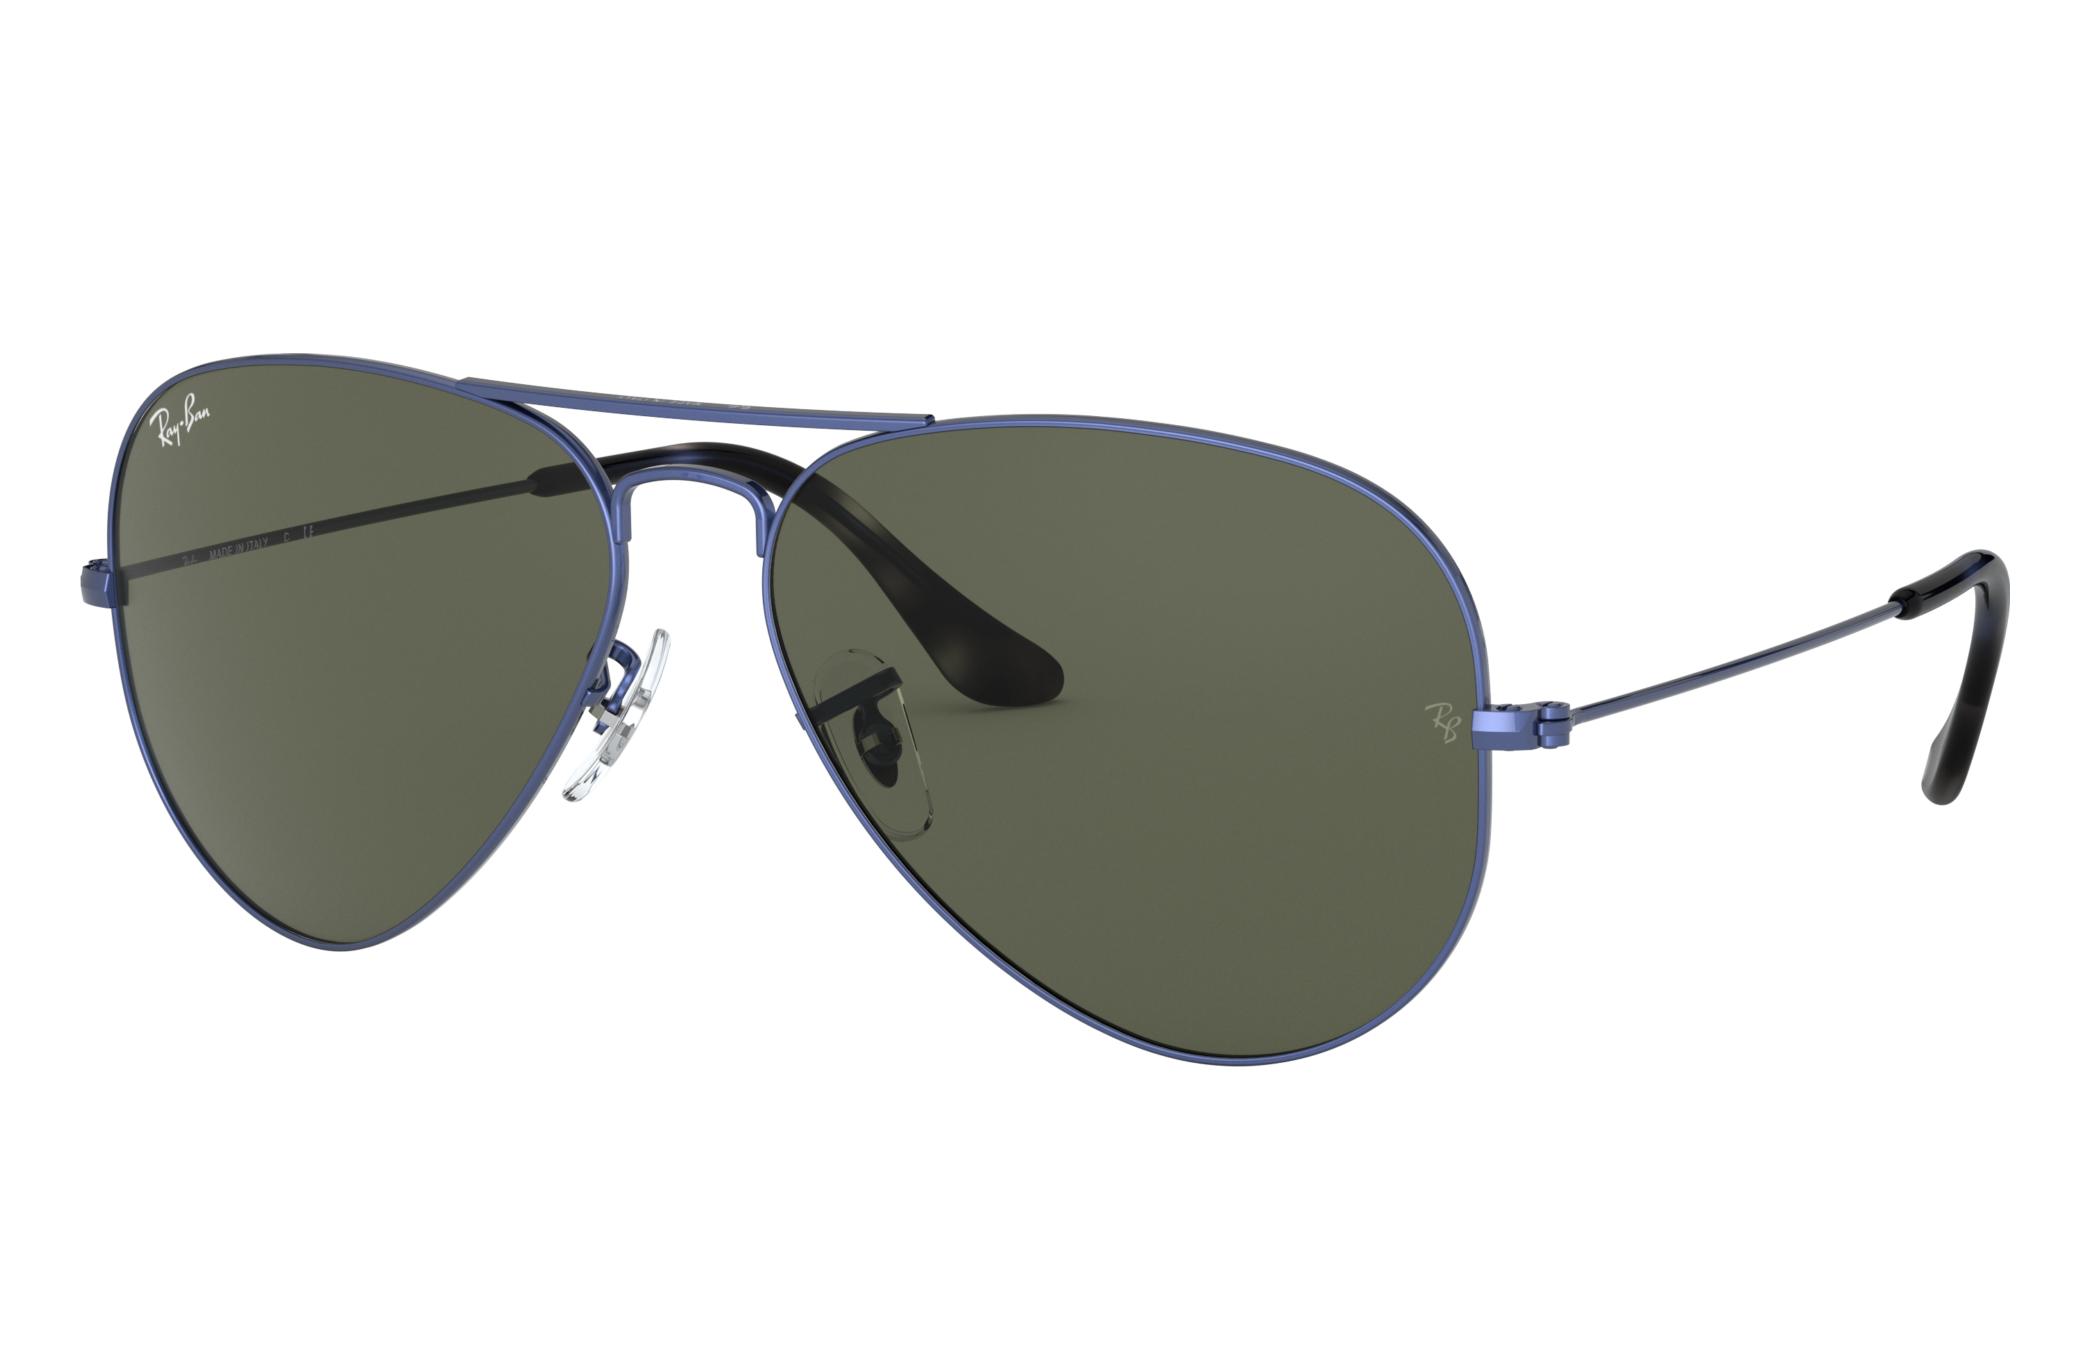 Ray-Ban Aviator Classic Blue Metal, Green Lenses - RB3025